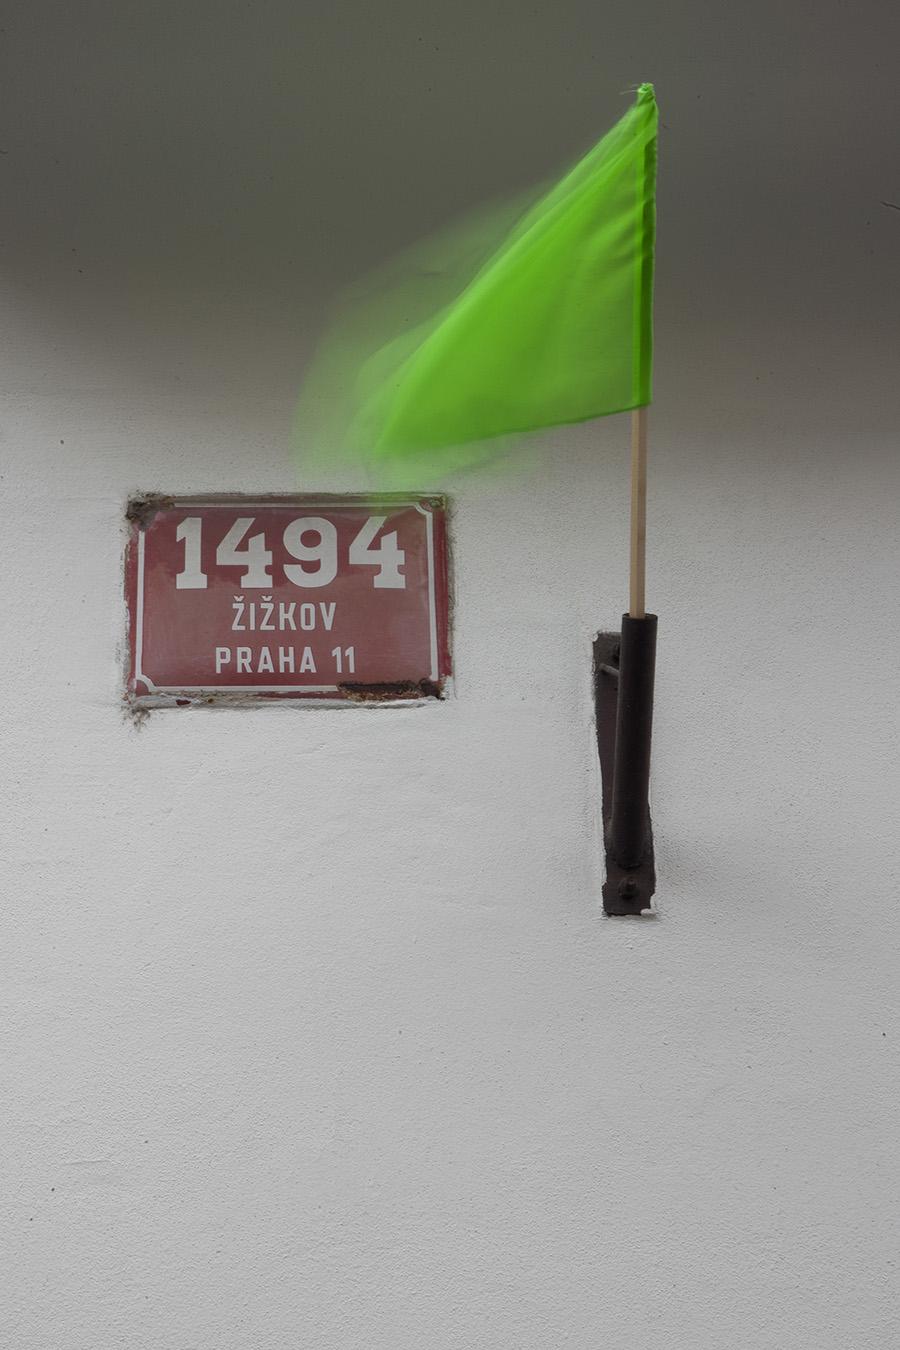 zdenek-svejkovsky-default-flags-2